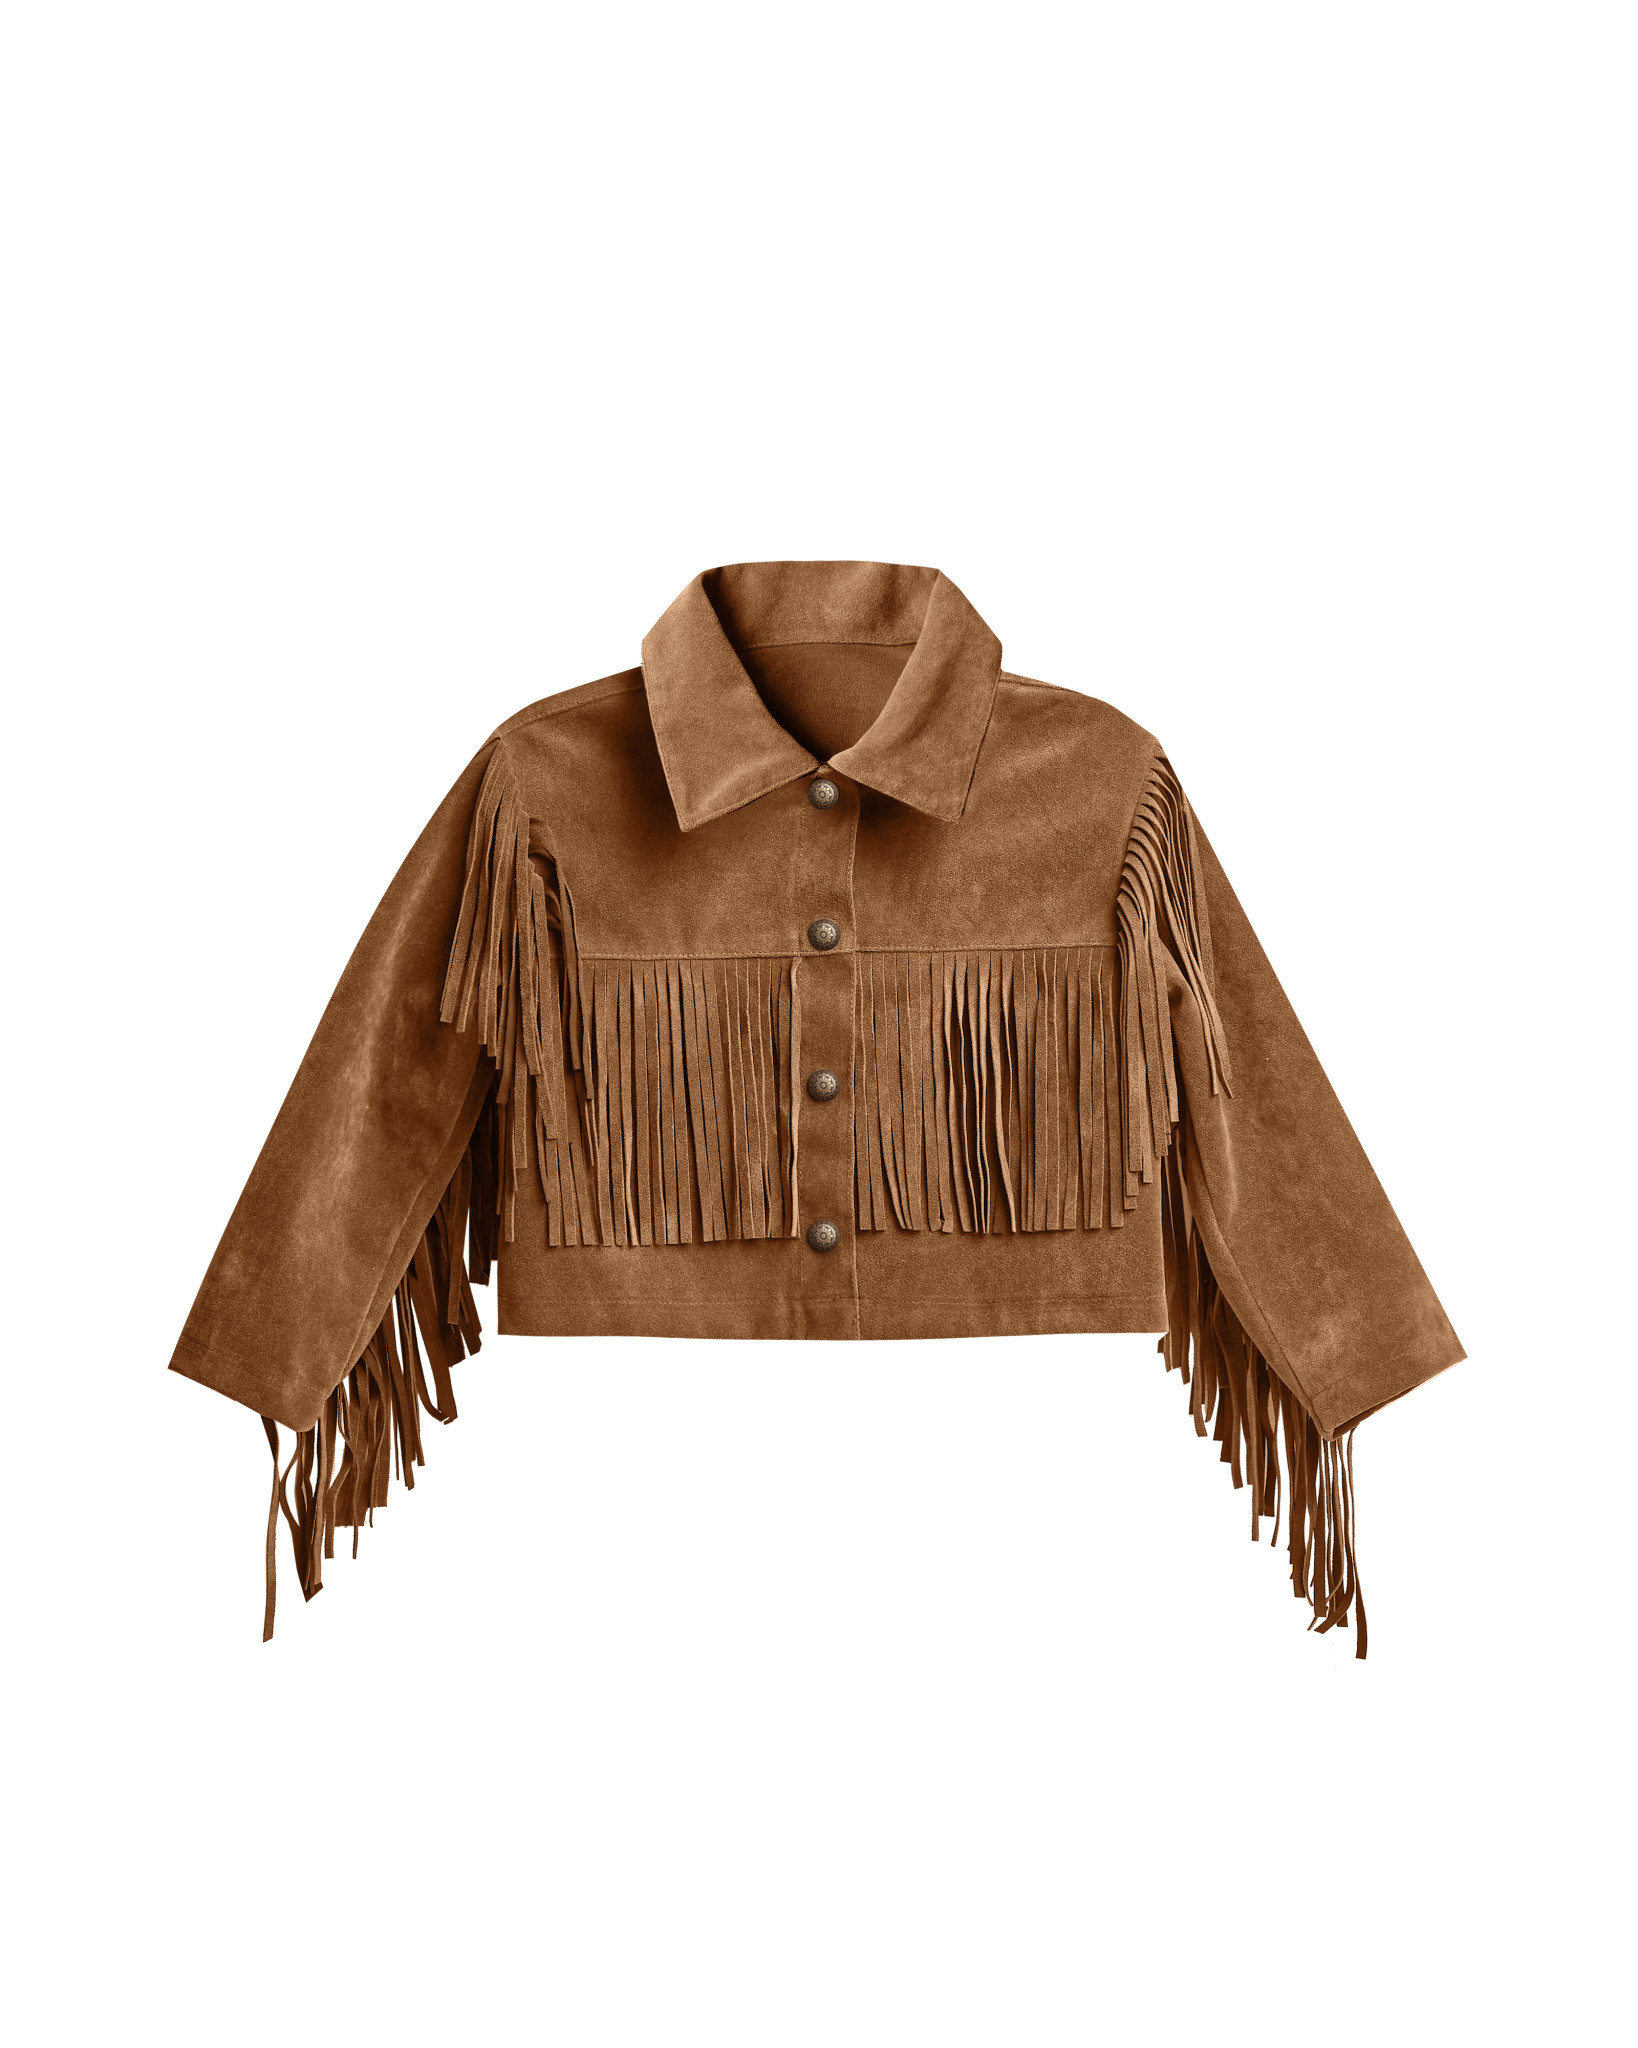 RYLEE AND CRU Fringe Jacket